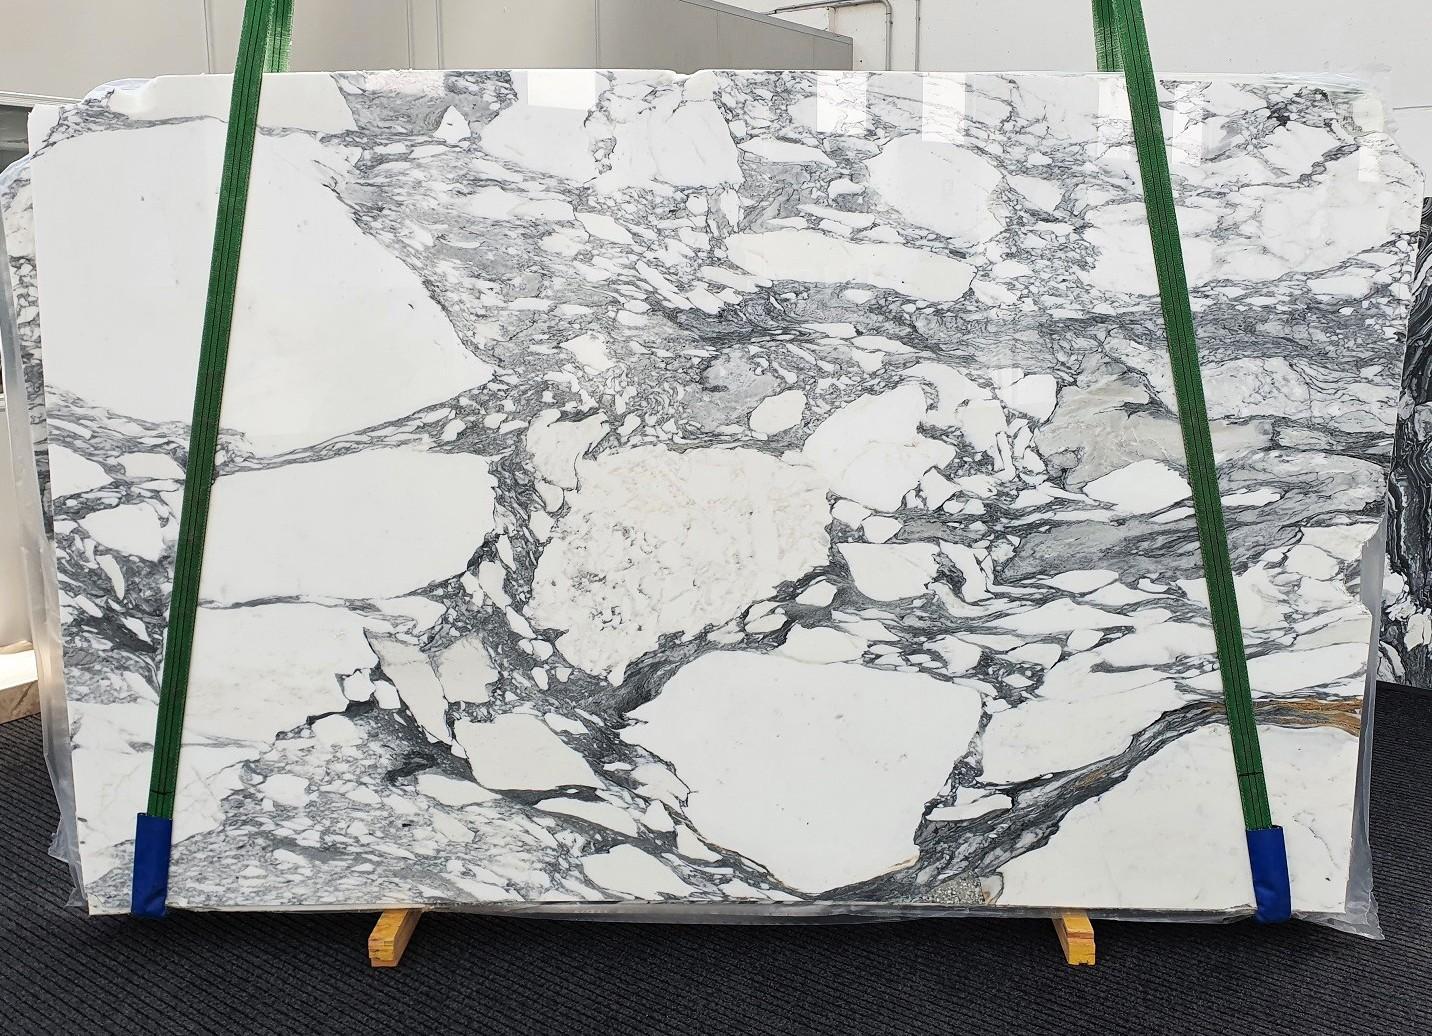 ARABESCATO CORCHIA polierte Unmaßplatten 1433 aus Natur Marmor , Slab #01: Lieferung Veneto, Italien